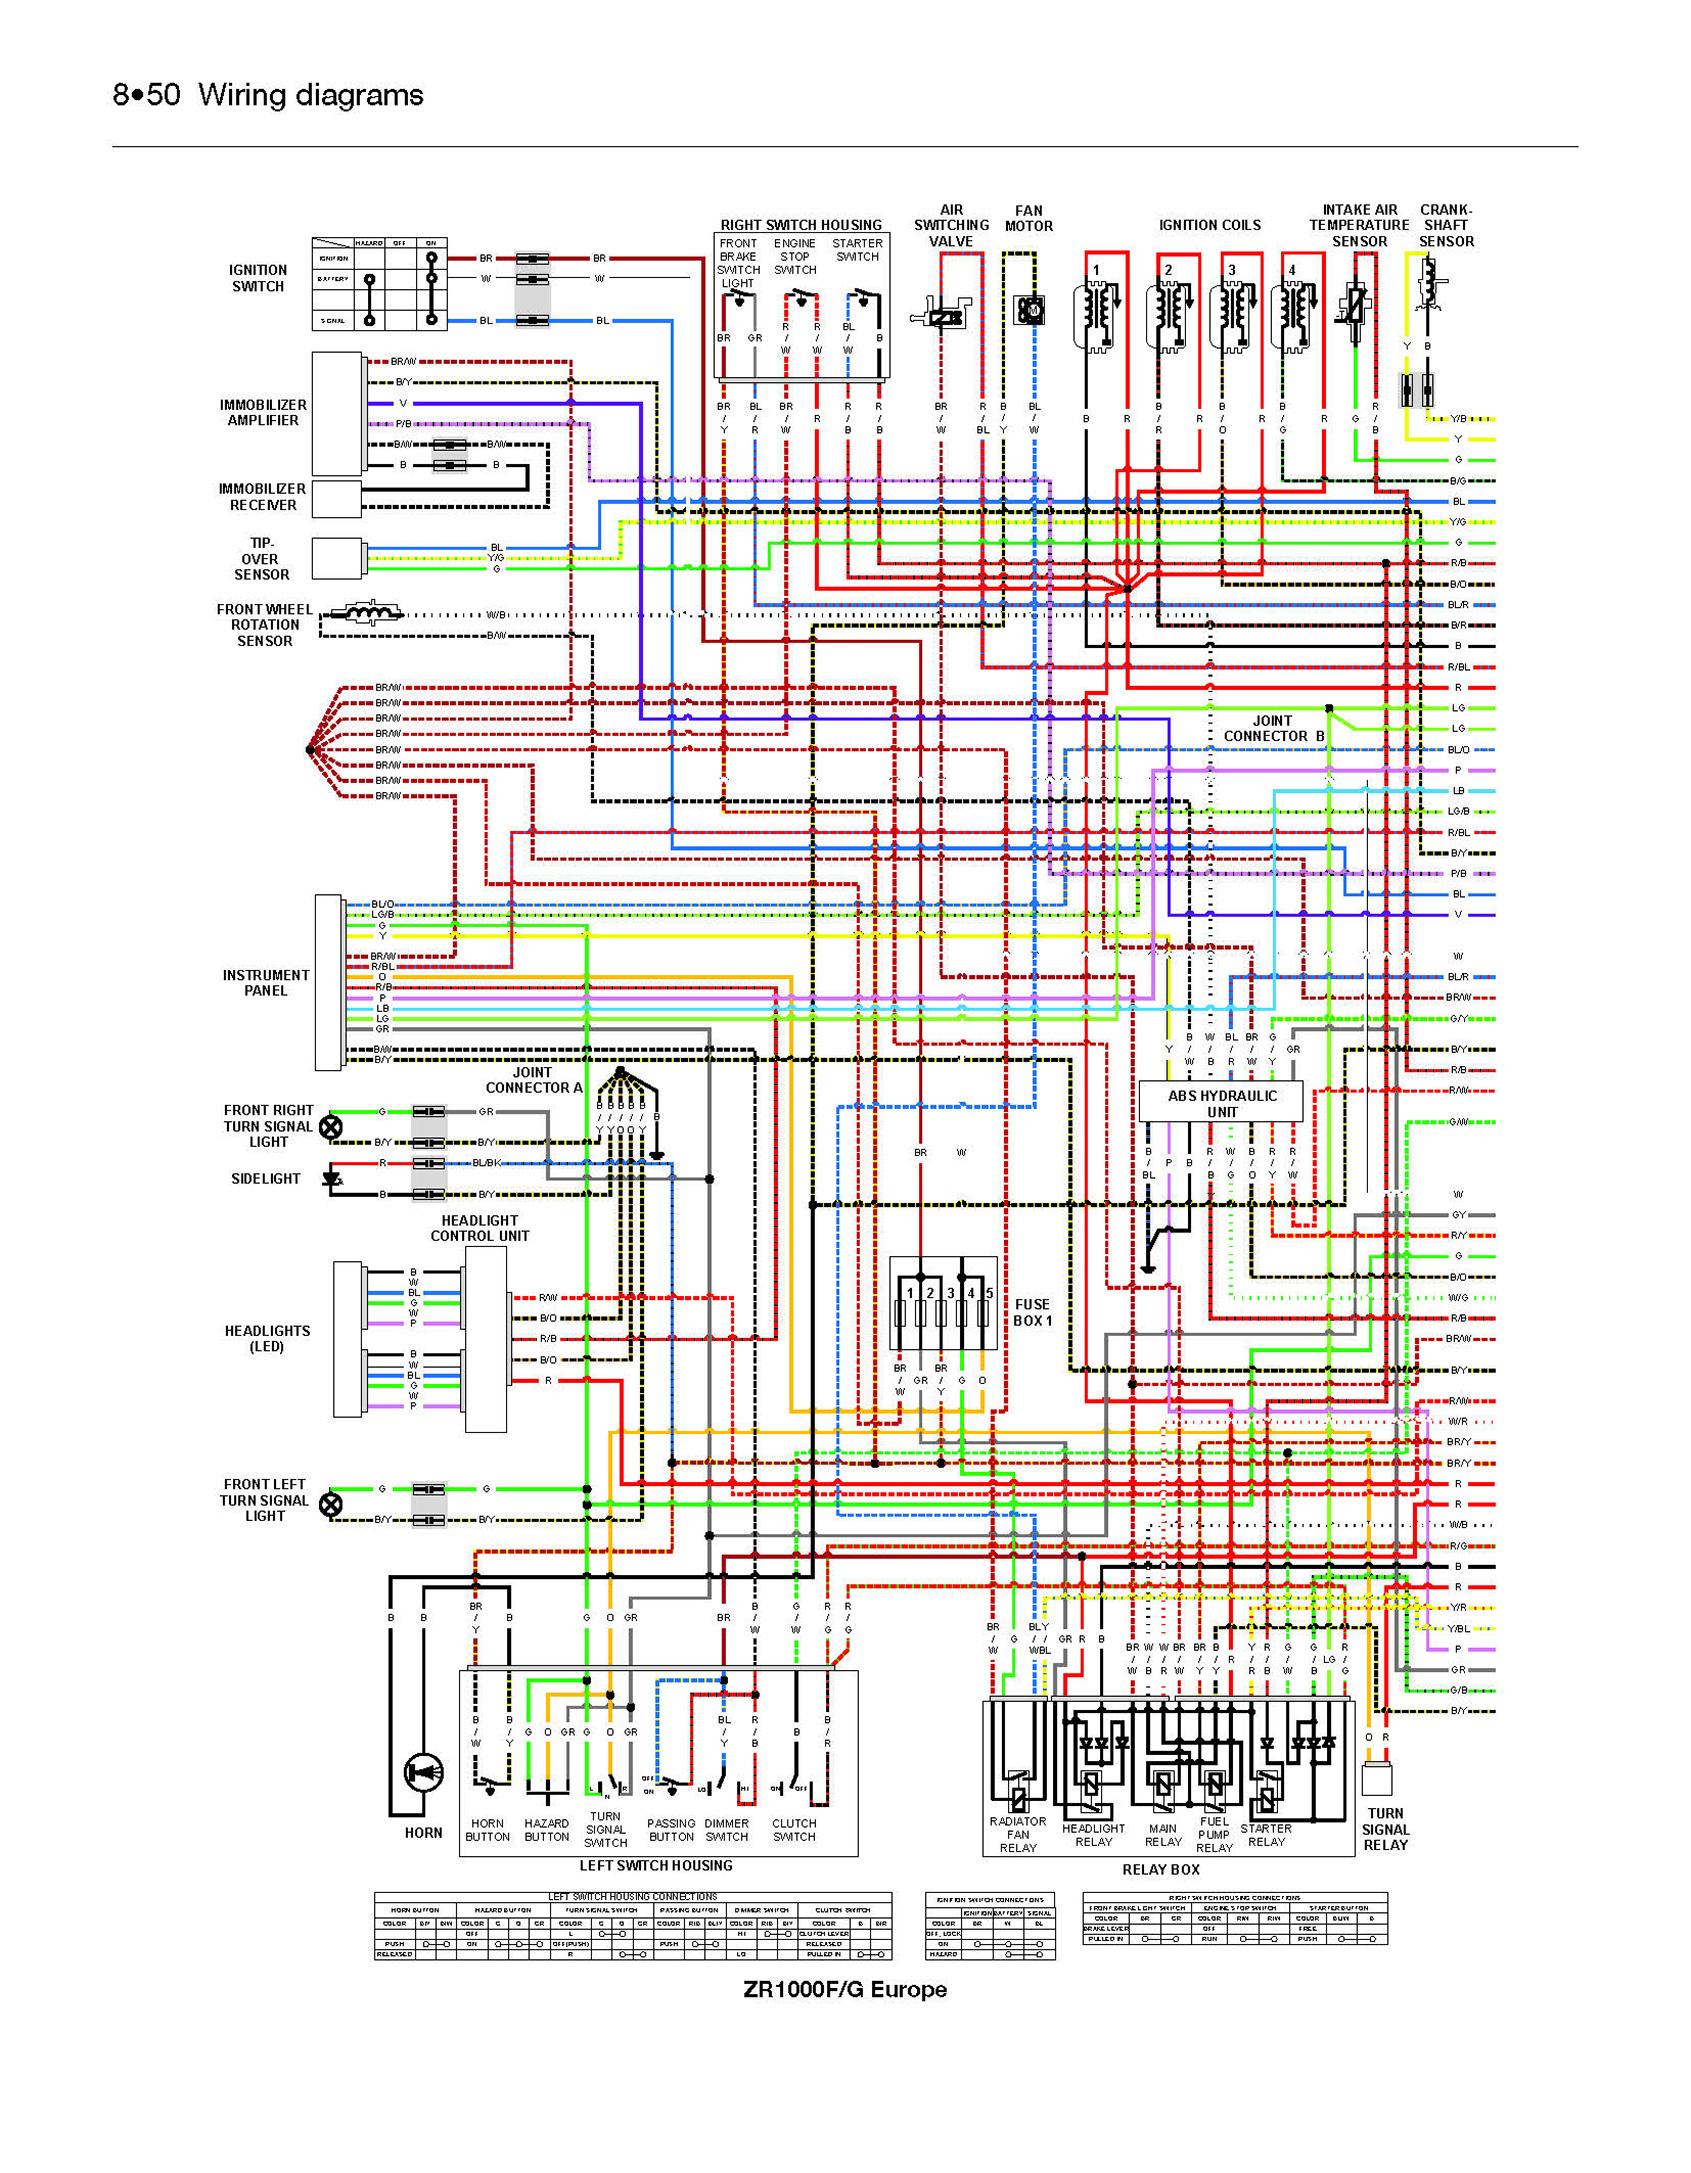 kawasaki wiring schematics so 9825  kawasaki versys 650 wiring diagram schematic wiring  kawasaki versys 650 wiring diagram